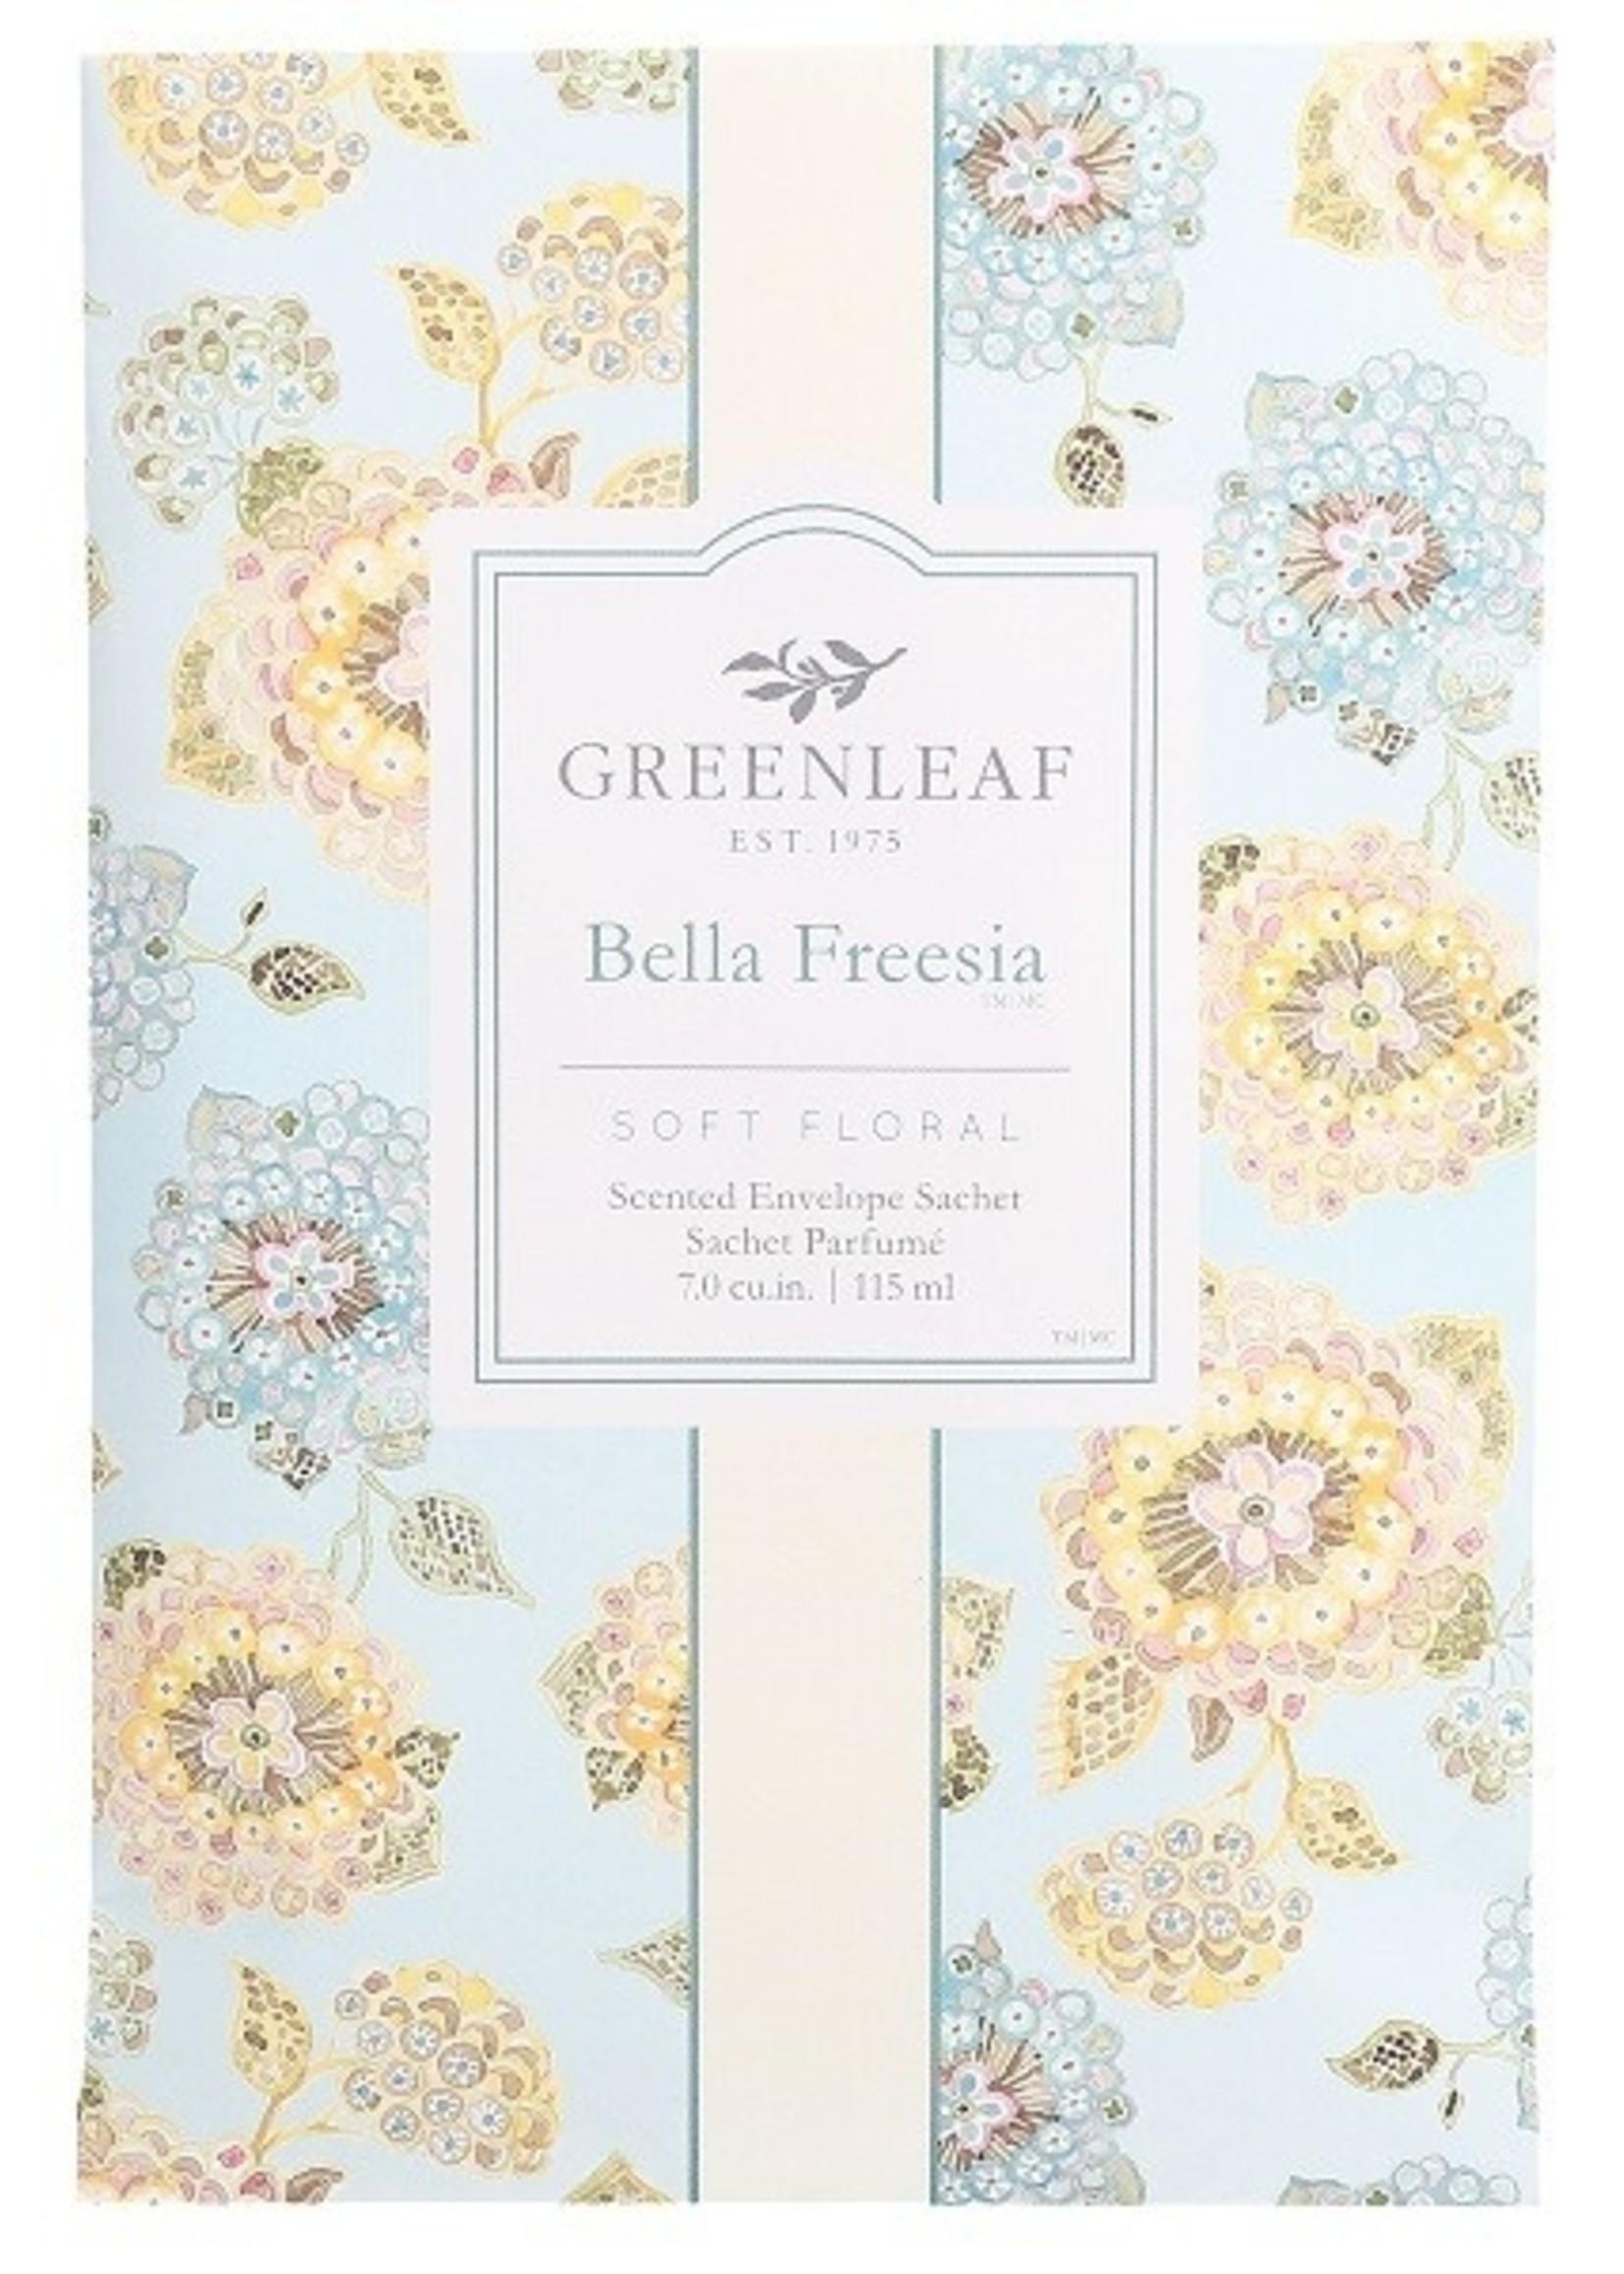 Greenleaf Greenleaf Geurzakje Bella Freesia